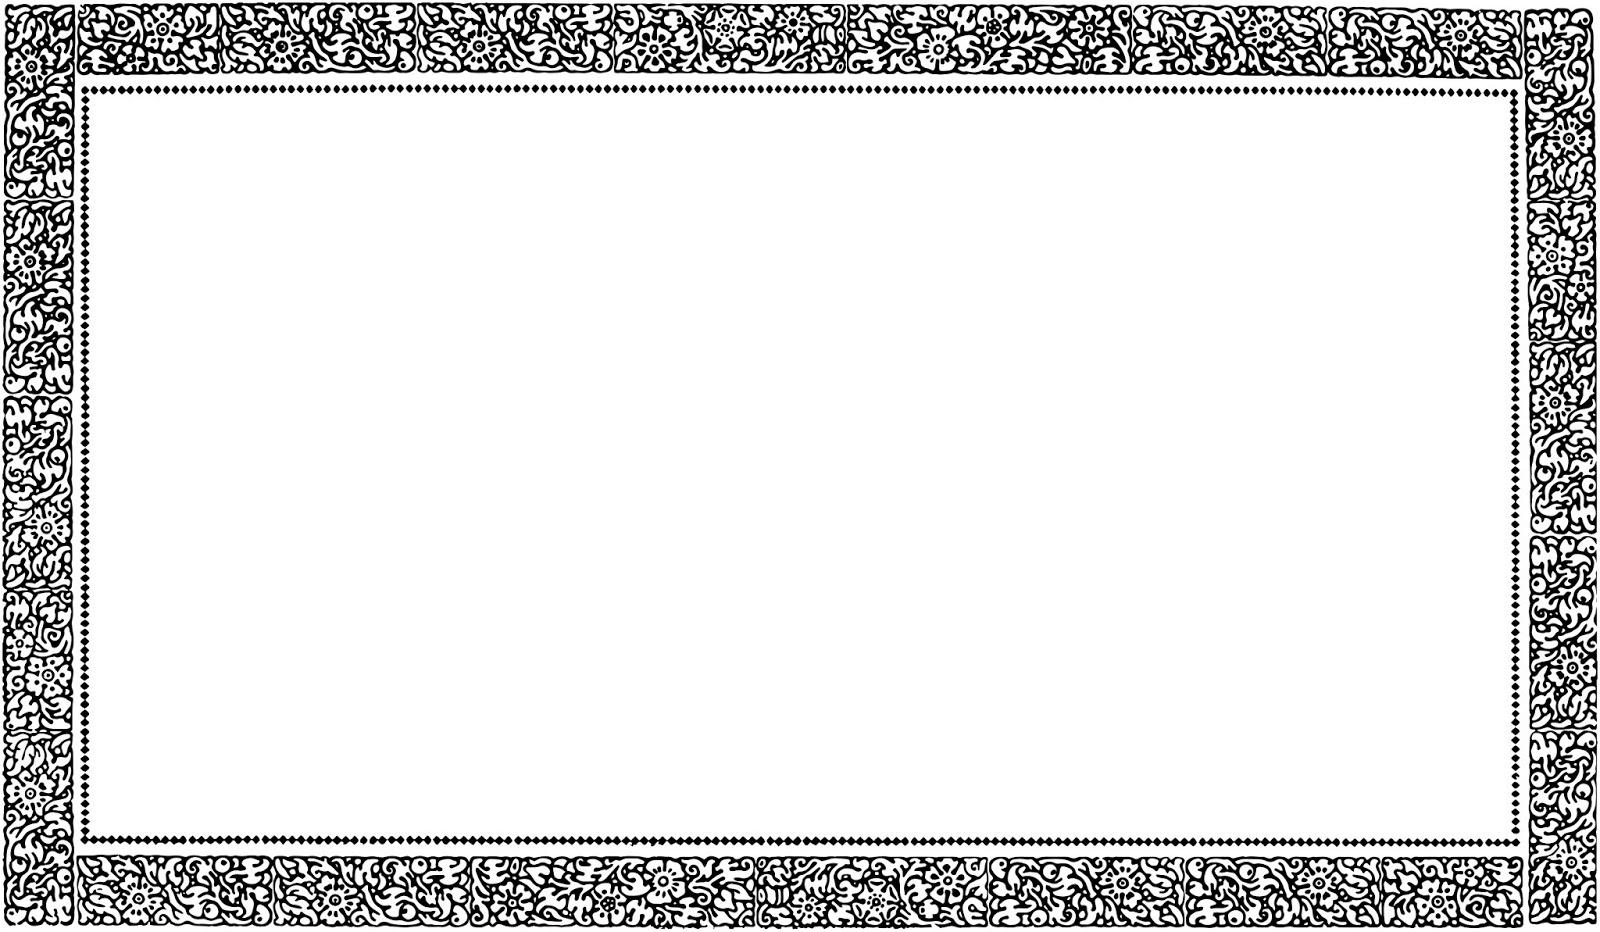 free vintage border templates .